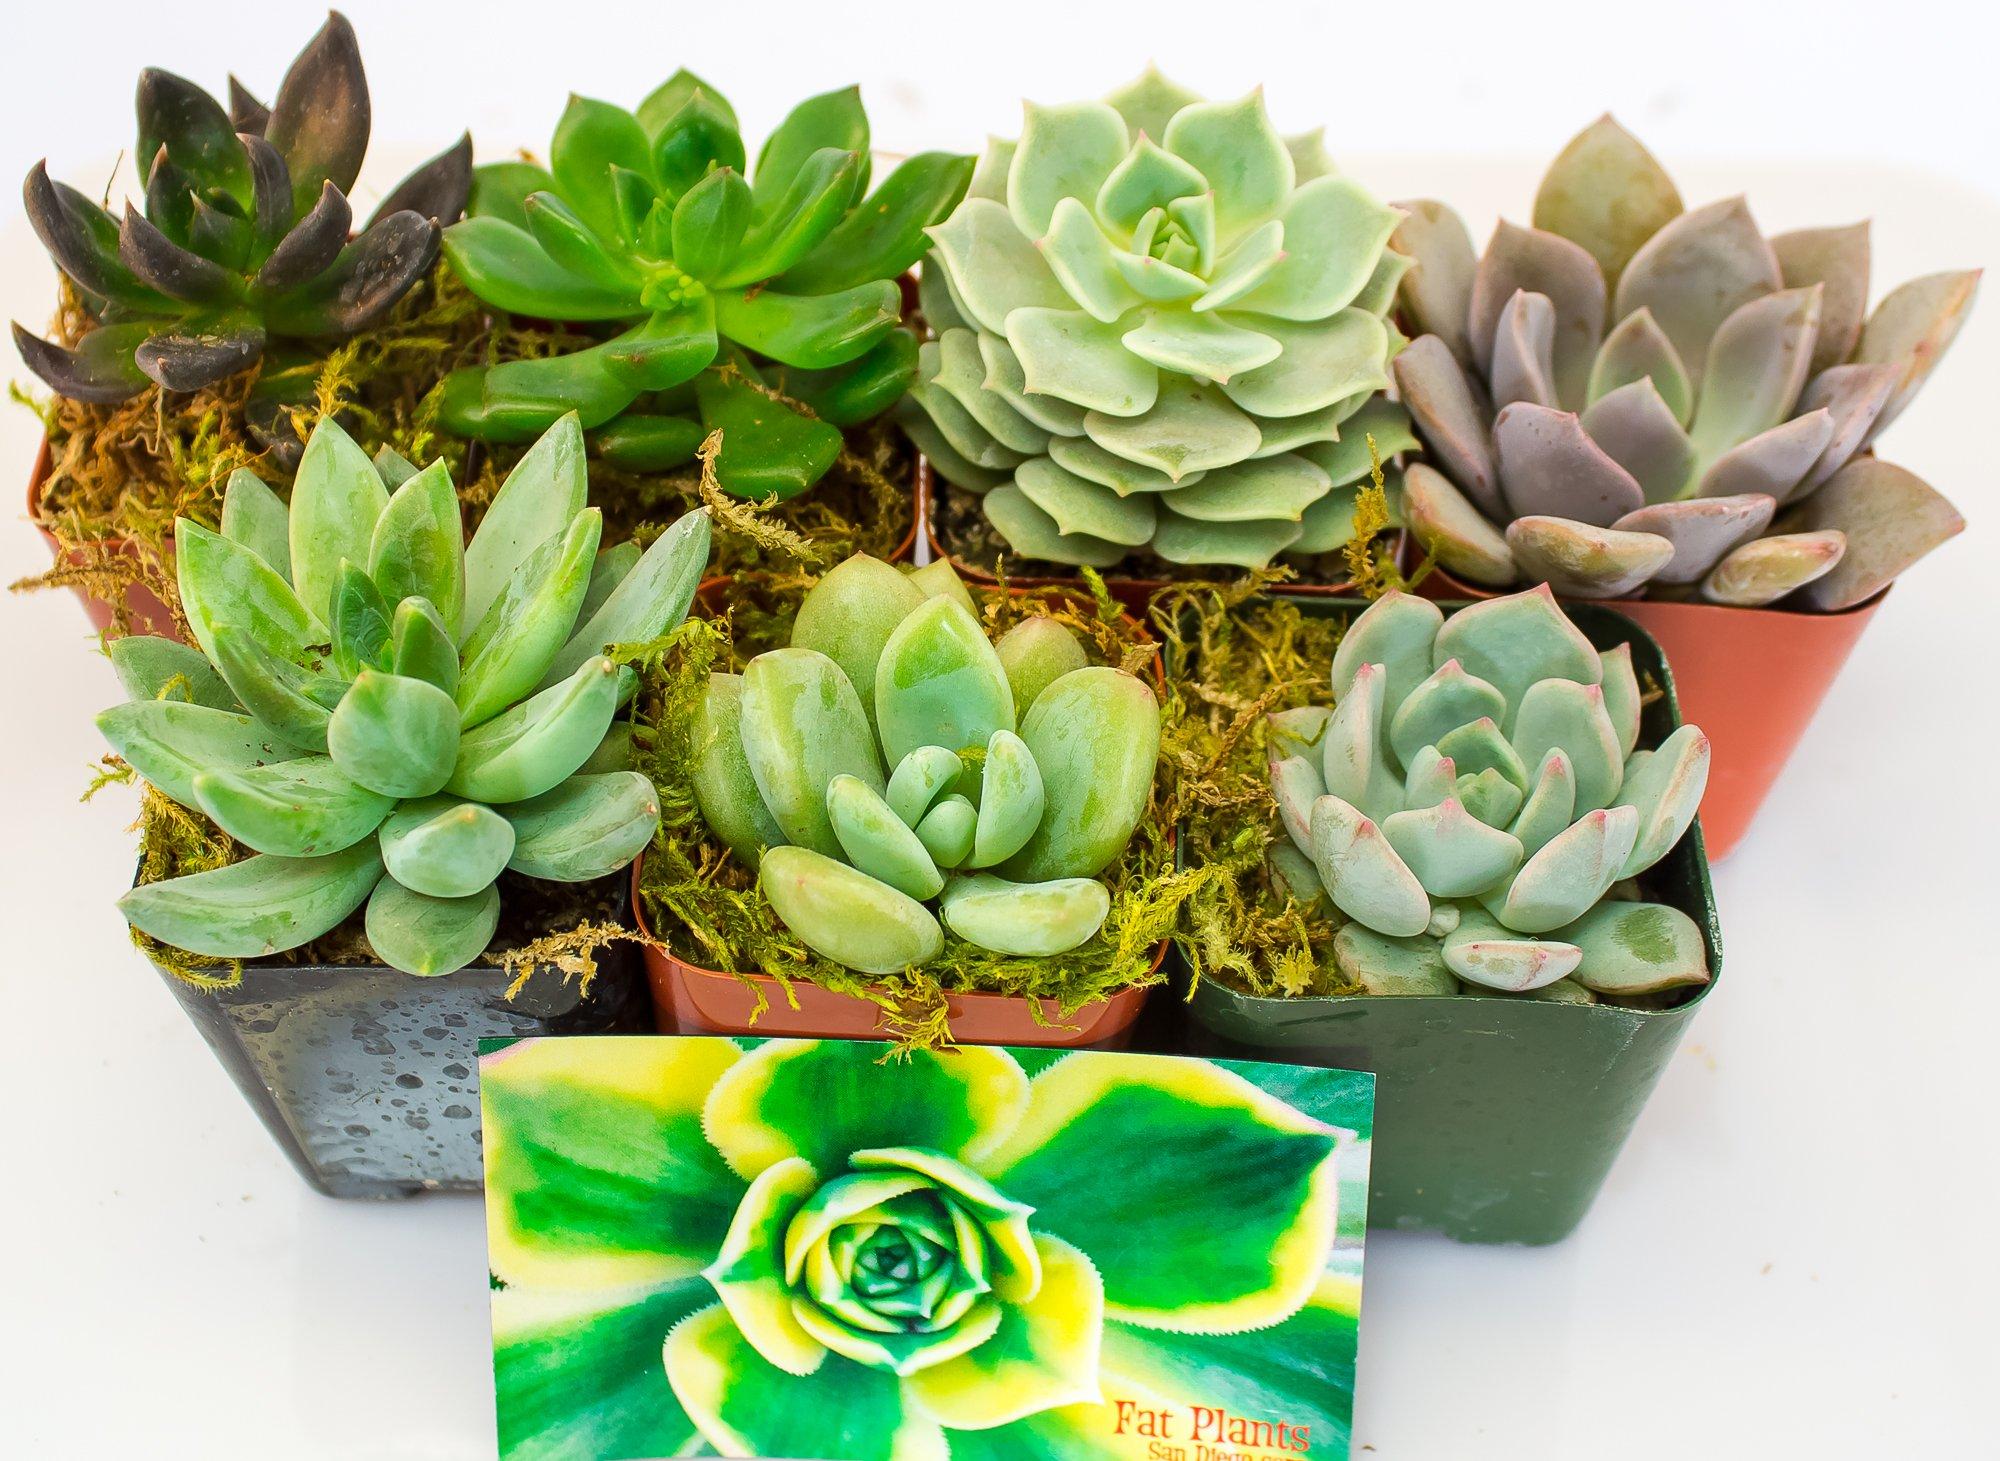 Fat Plants San Diego All Rosette Succulent Plants in 2 Inch Pots (7)